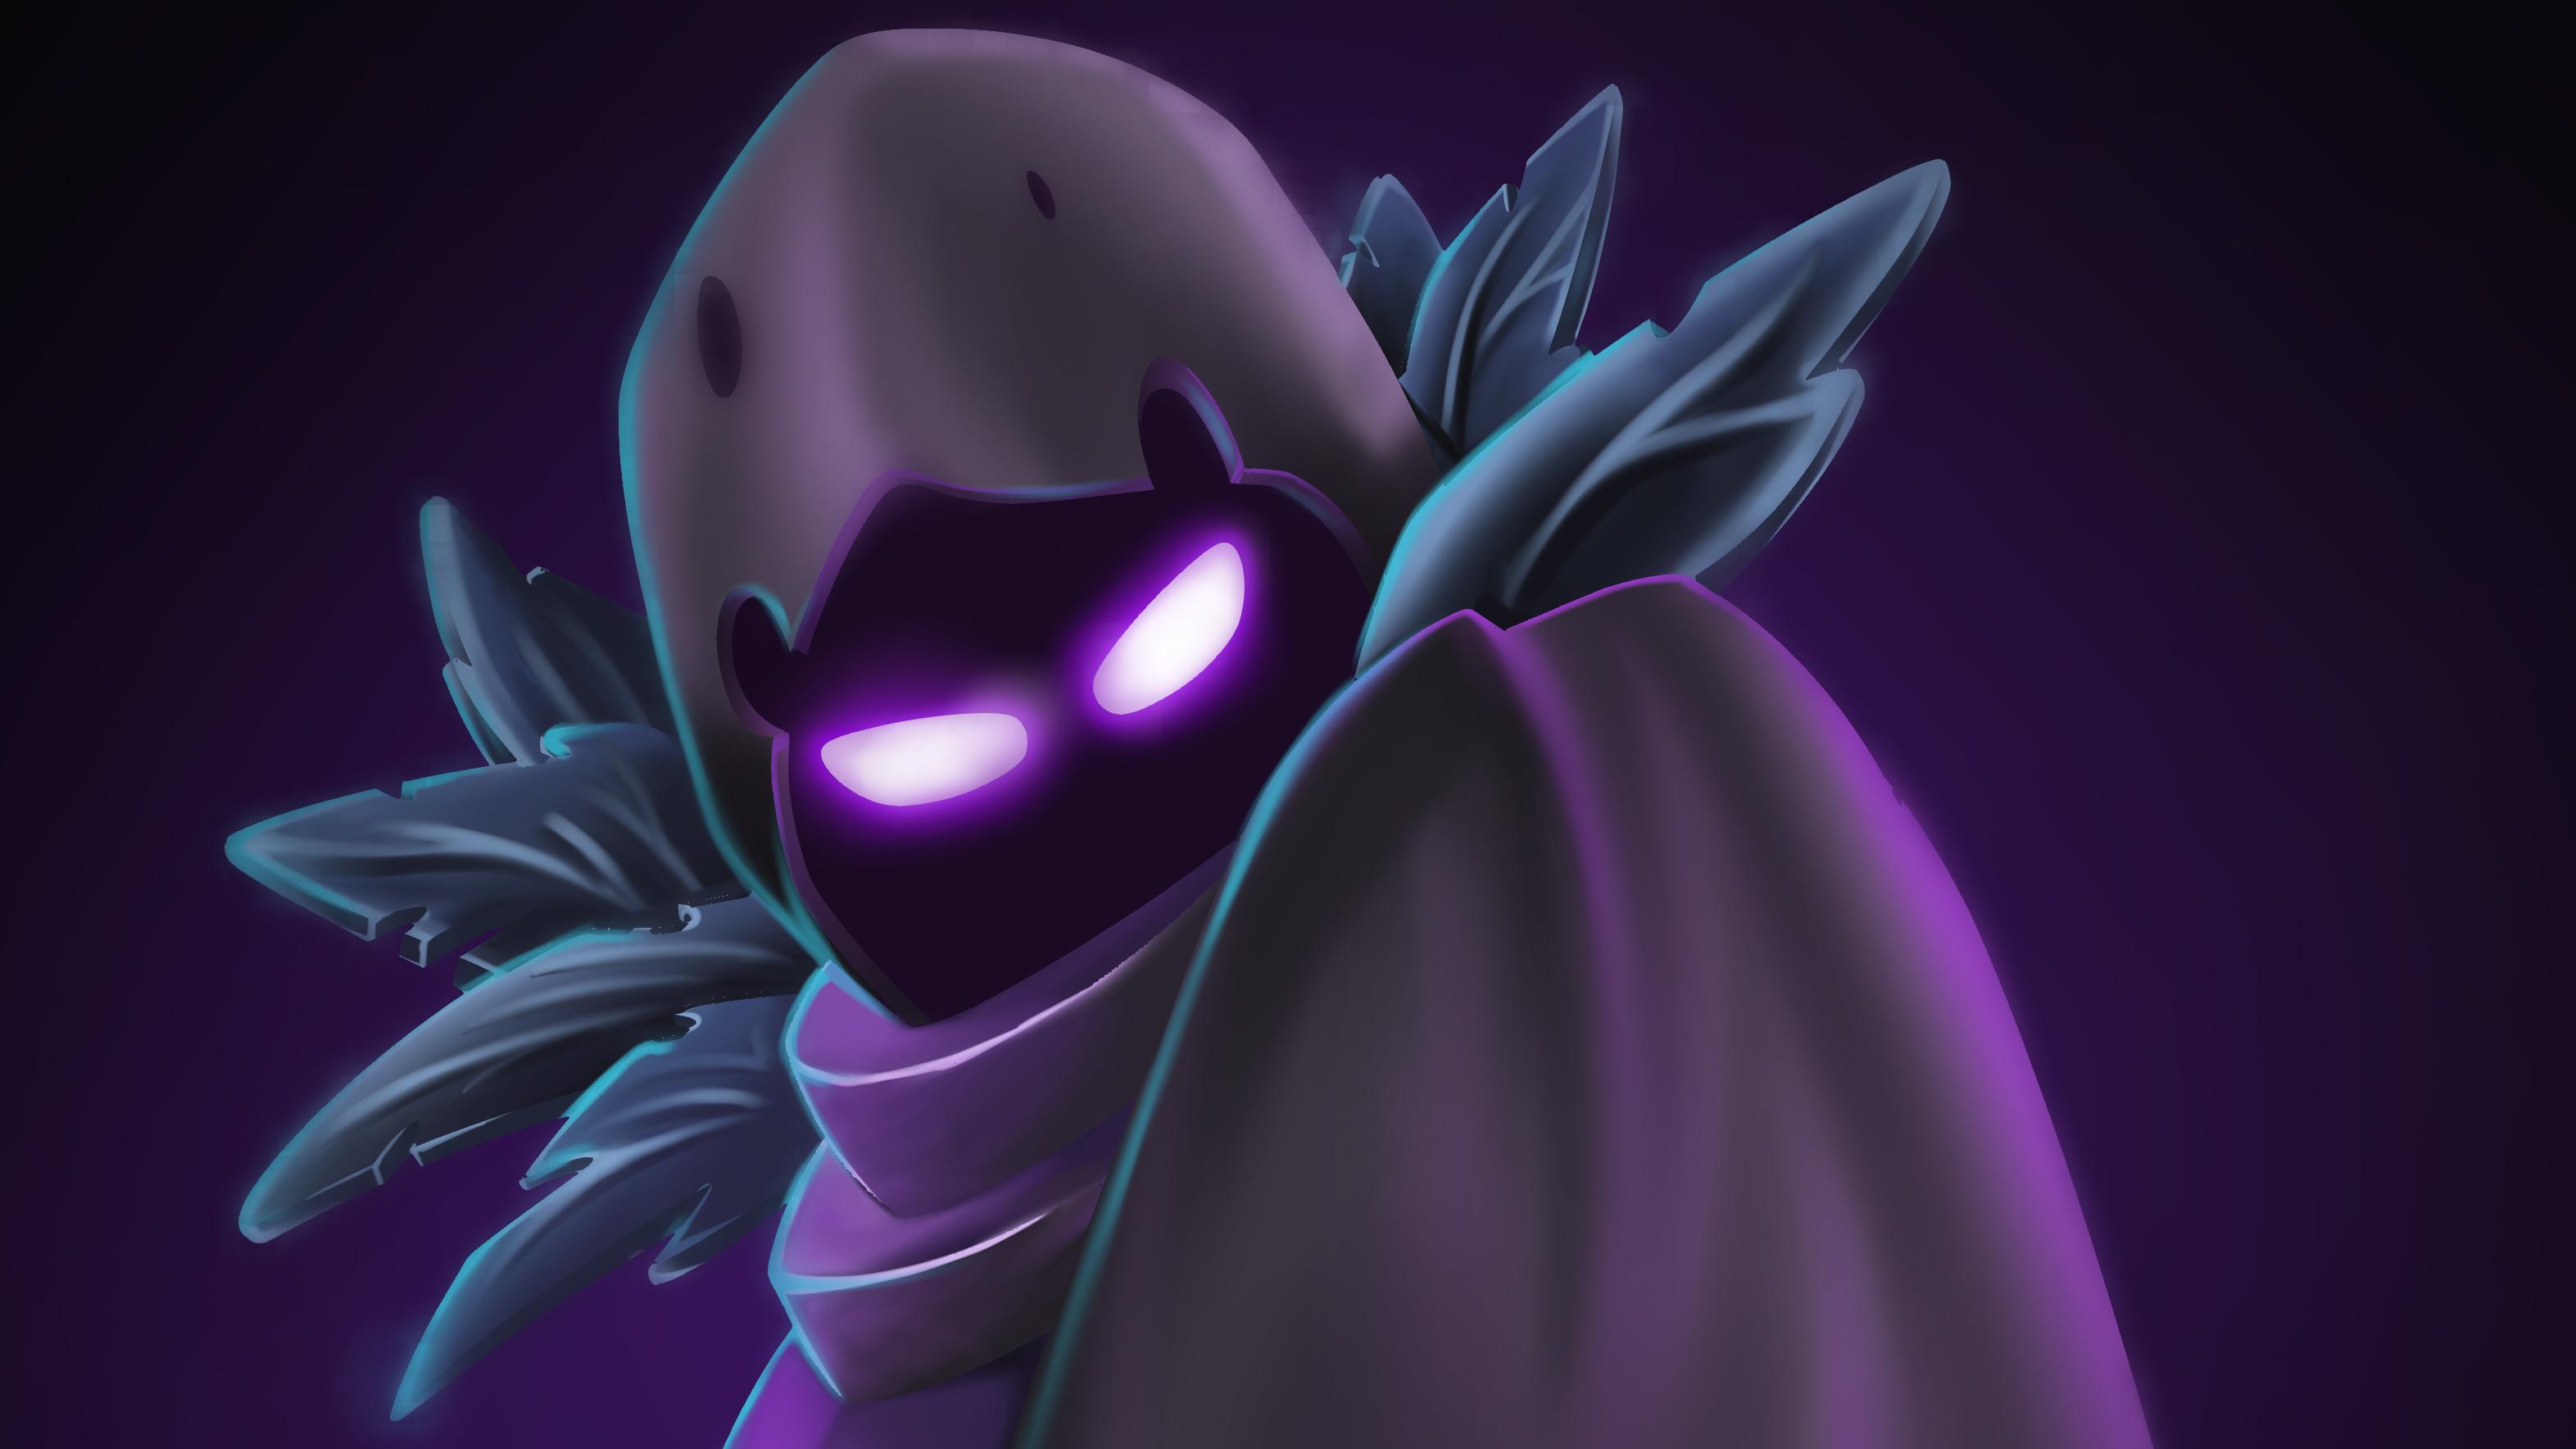 Raven Fortnite Battle Royale Season 6 4k